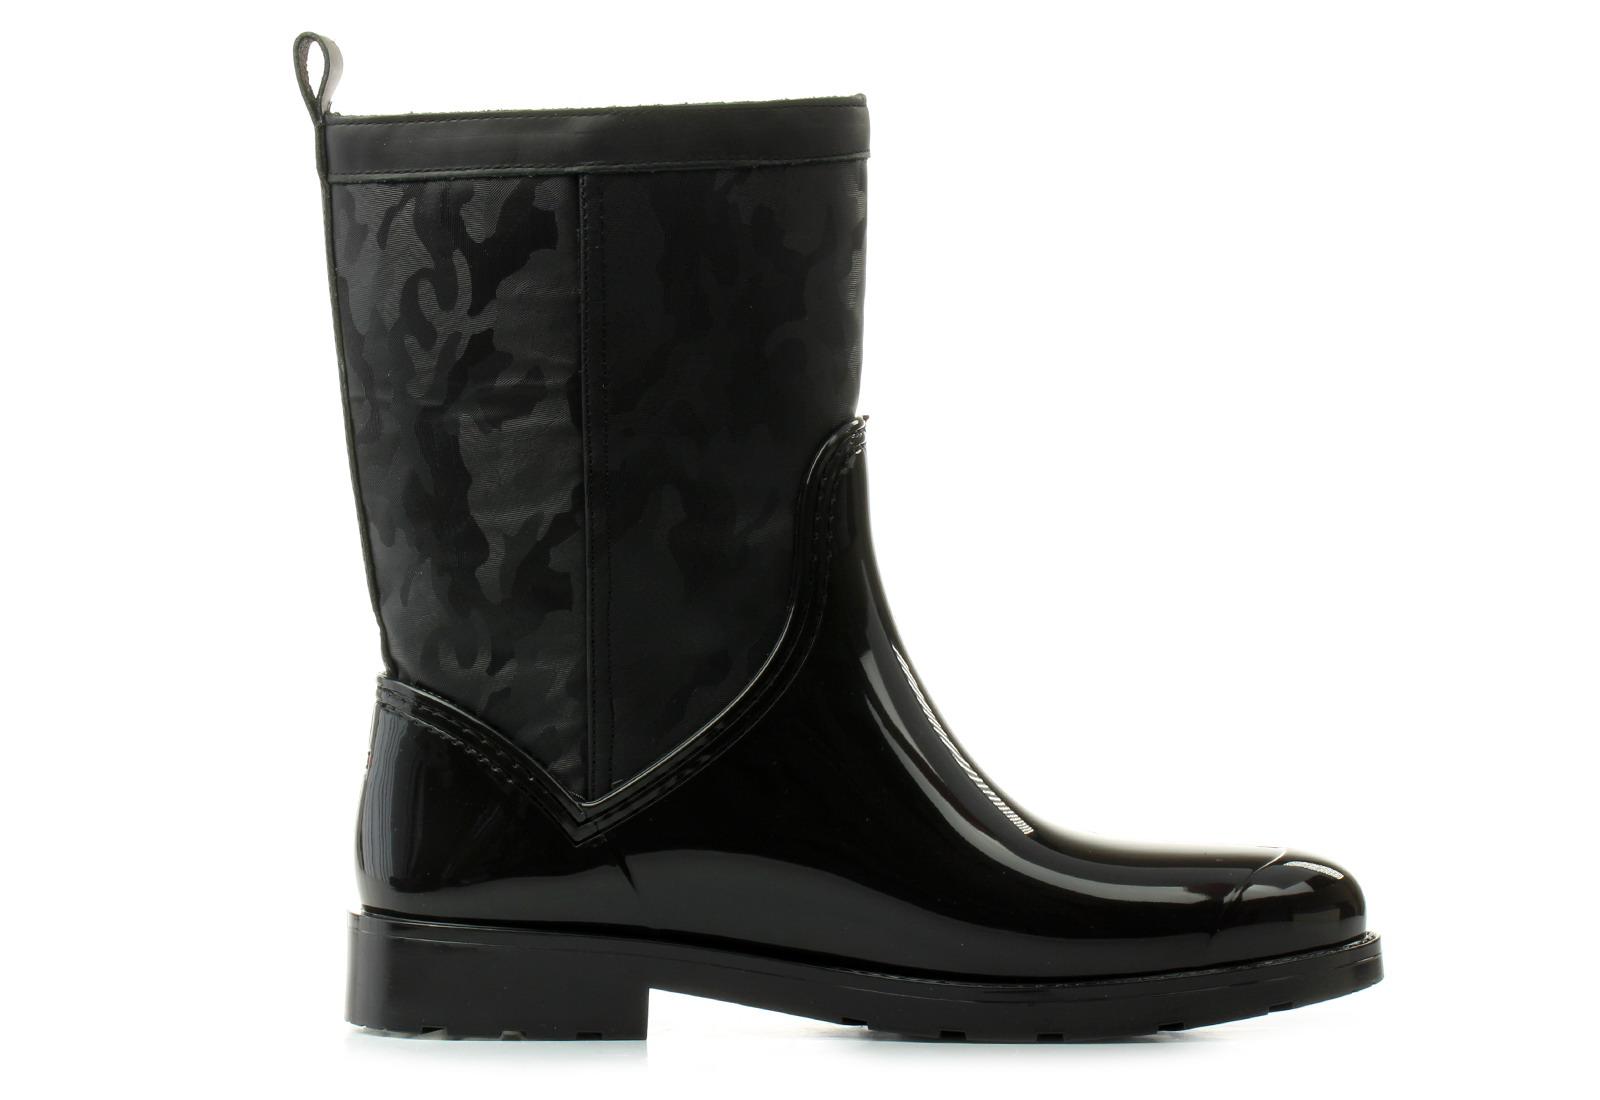 Tommy Hilfiger Csizma - Oxford 27cw - 18F-3318-990 - Office Shoes ... 6d5ccff65f